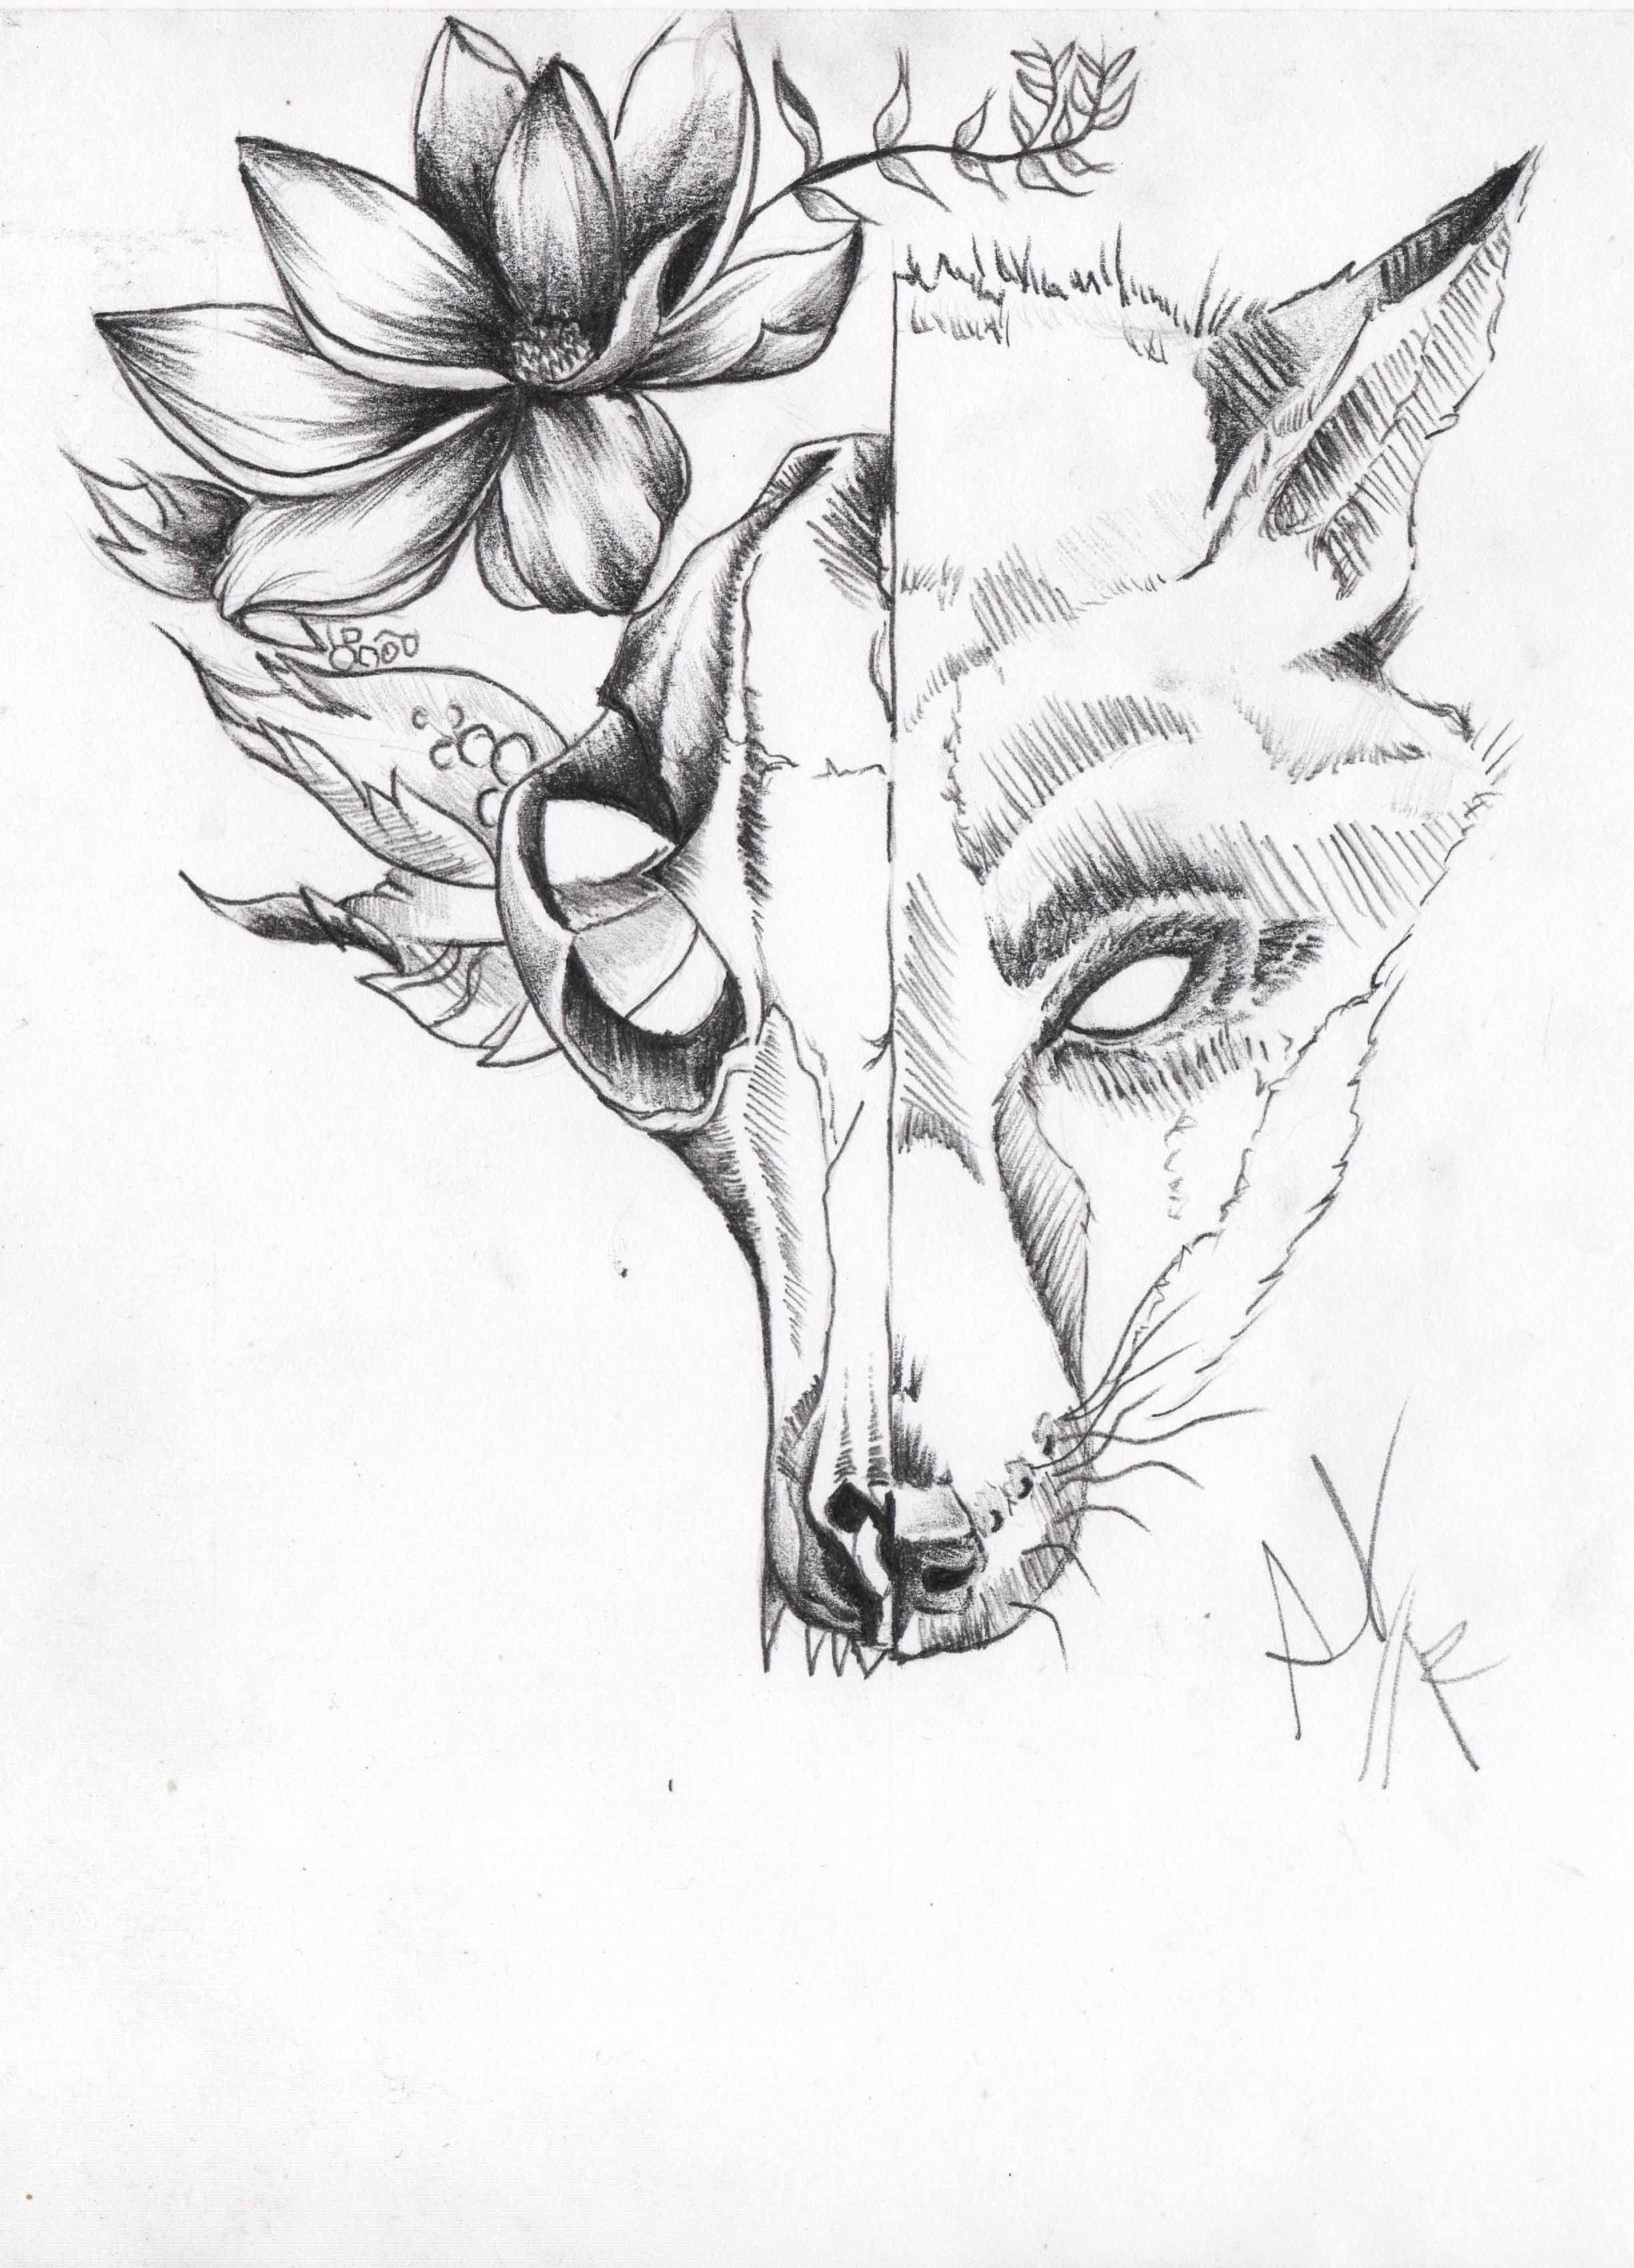 calavera de zorro tattoo diseño en 2019